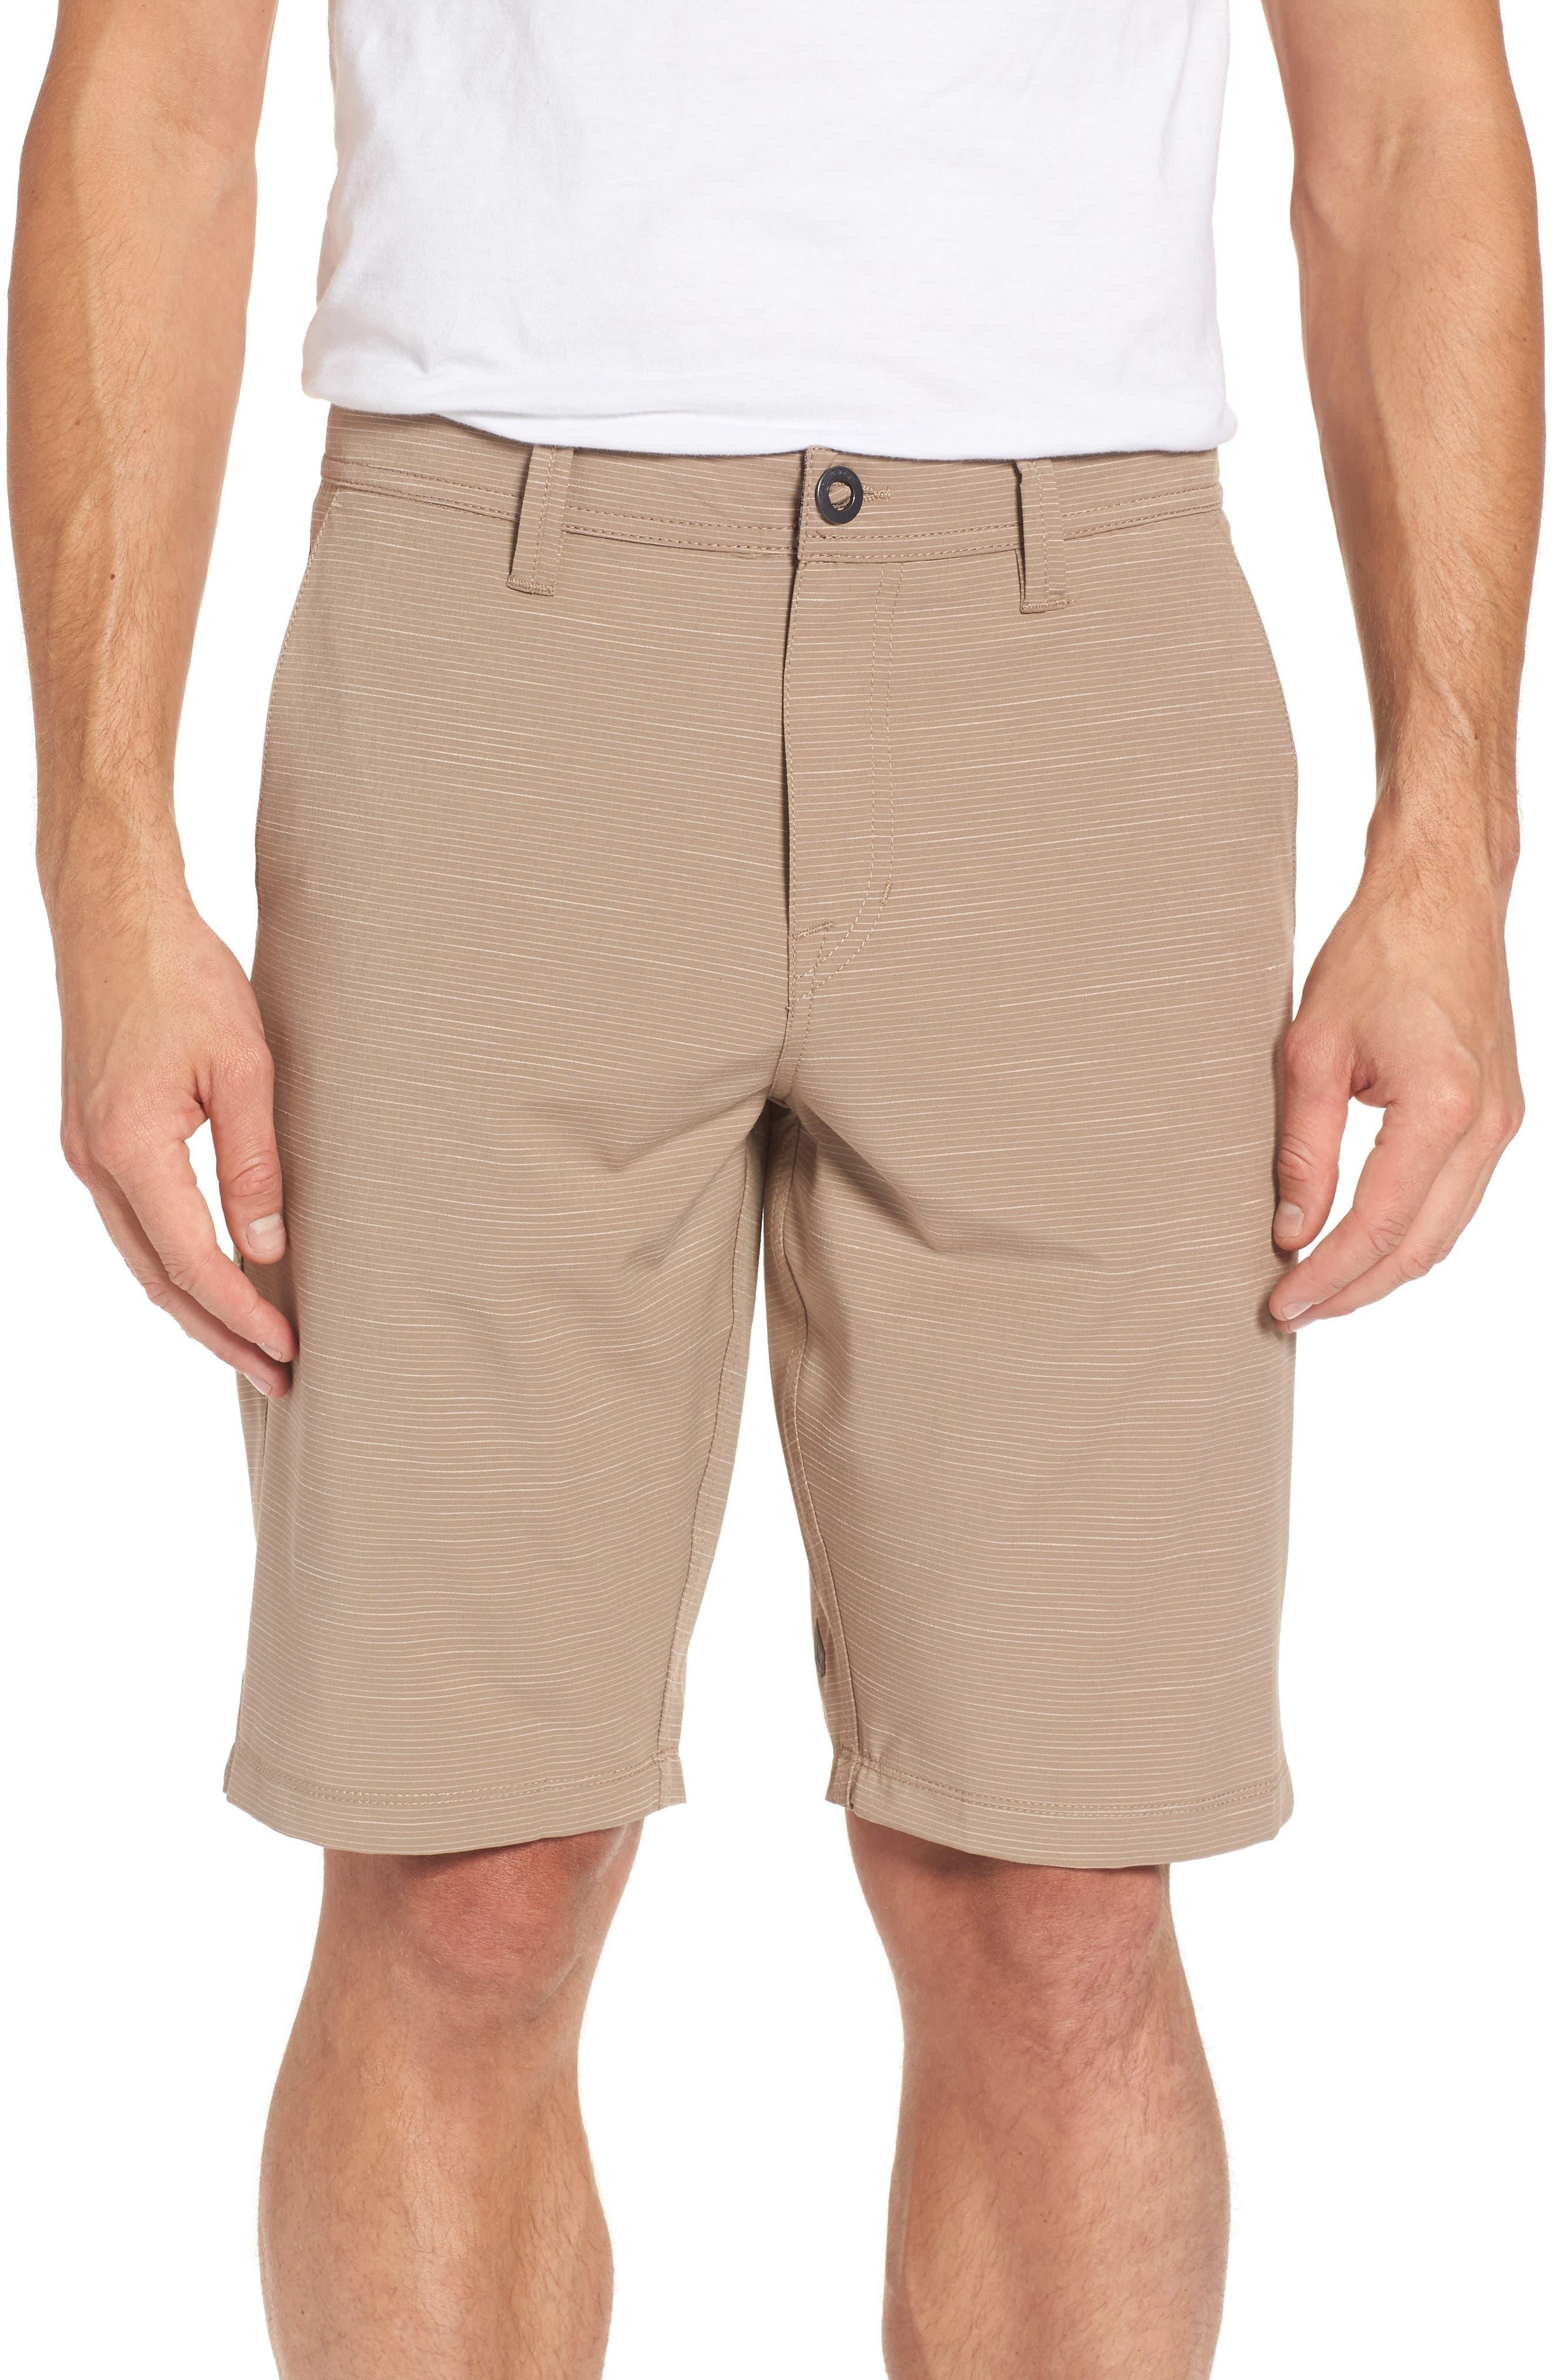 Surf 'N Turf Shorts,                         Main,                         color, Beige